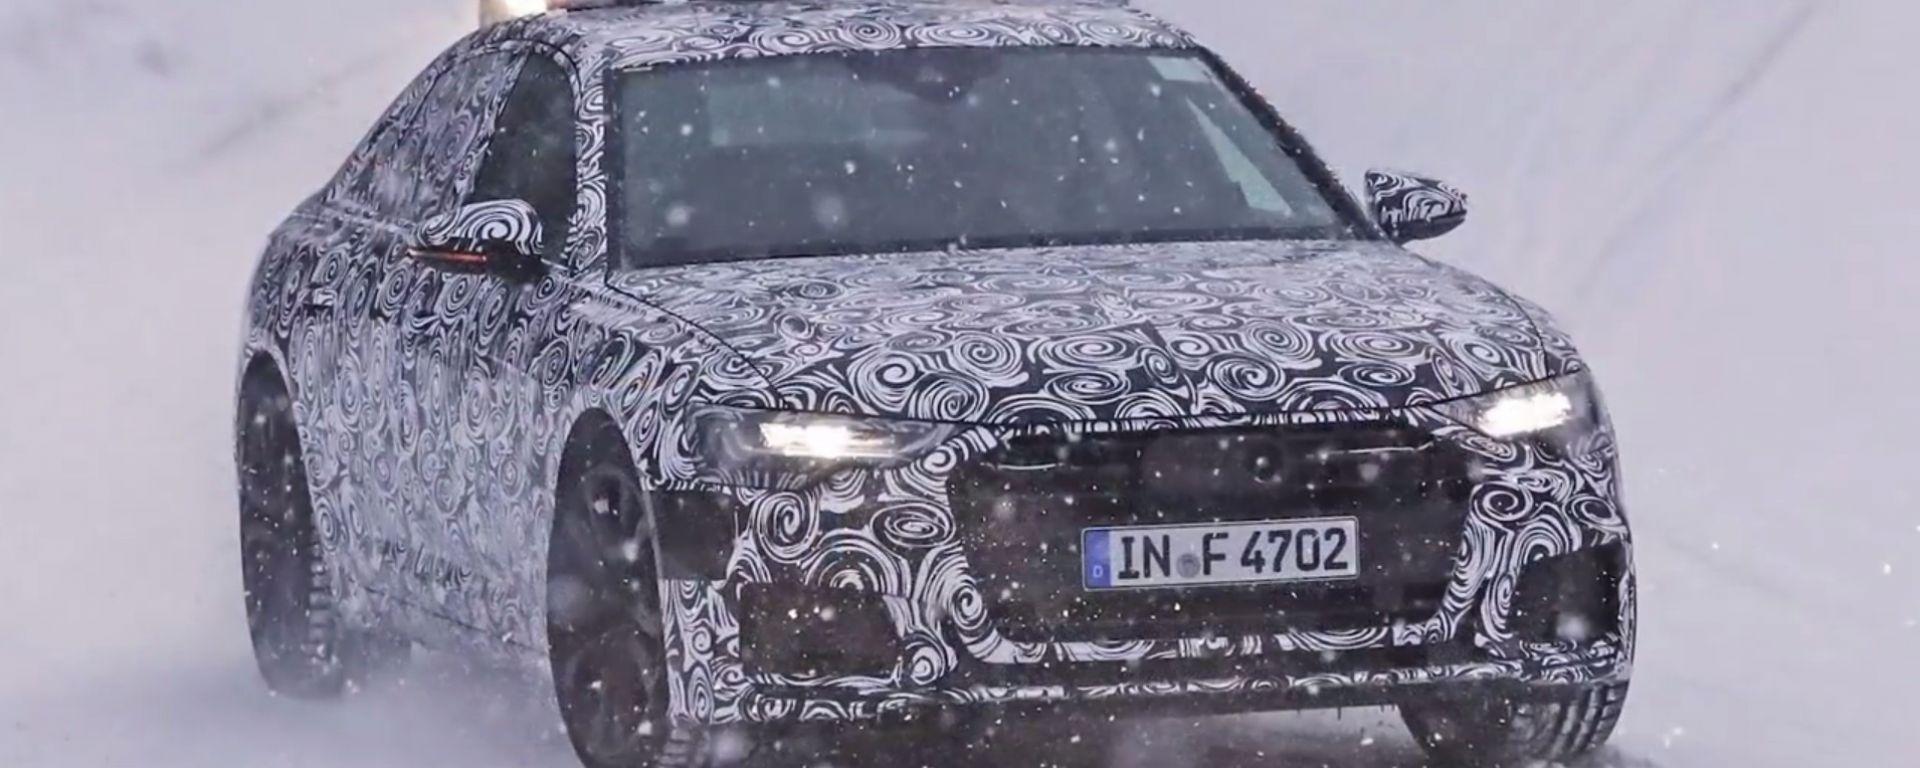 Nuova Audi A6 2018: le foto spia